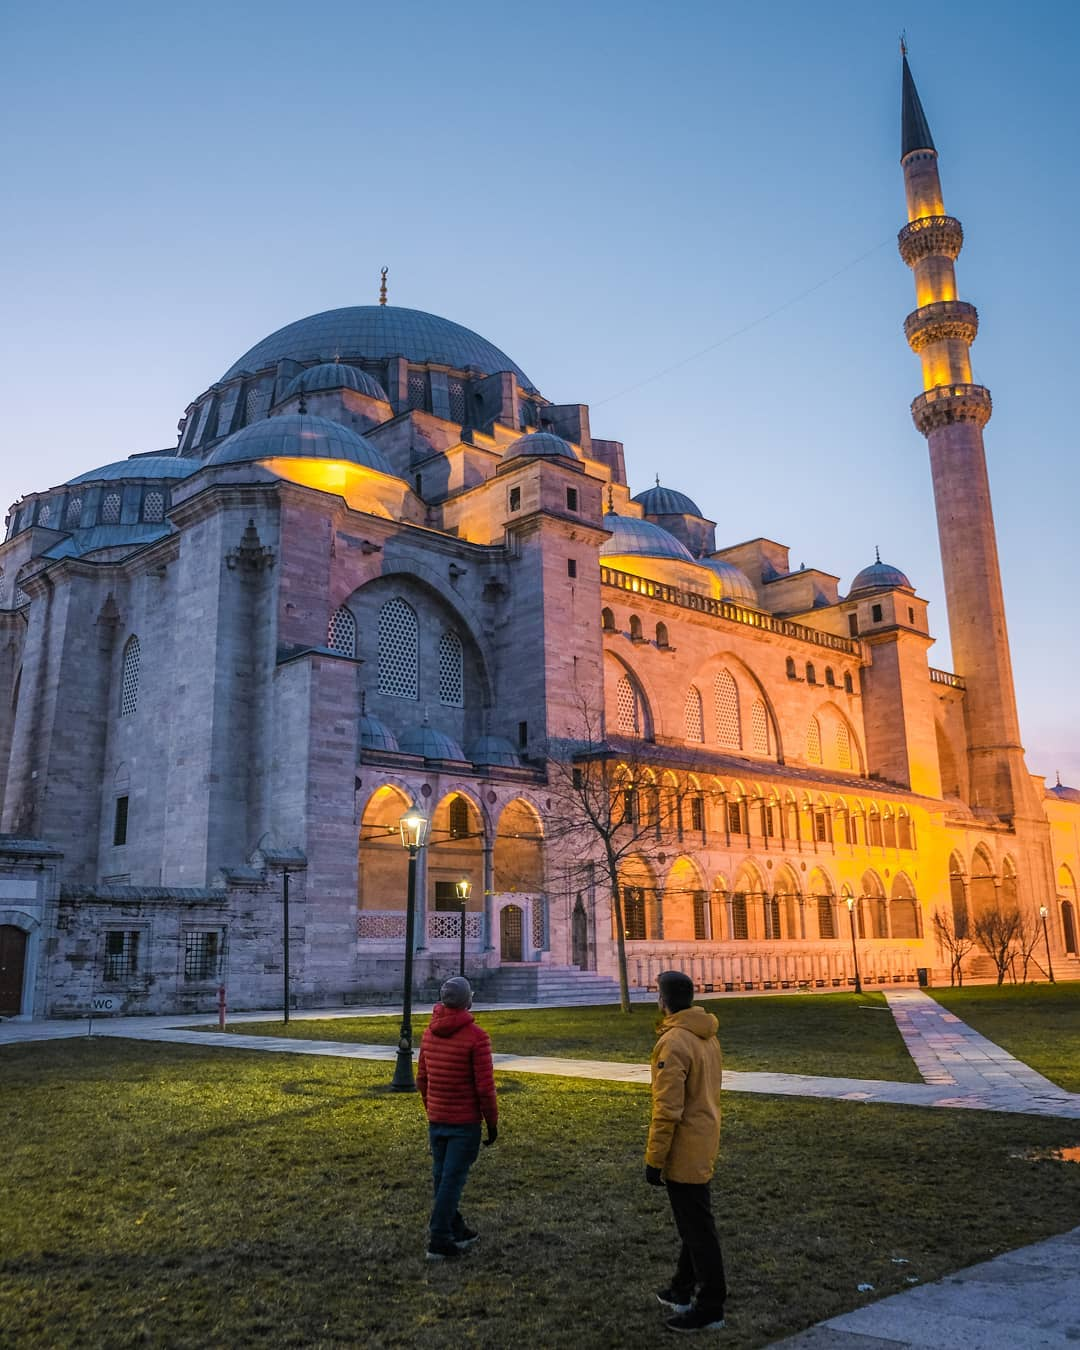 Cosas-que-debes-saber-antes-de-viajar-a-Turquia